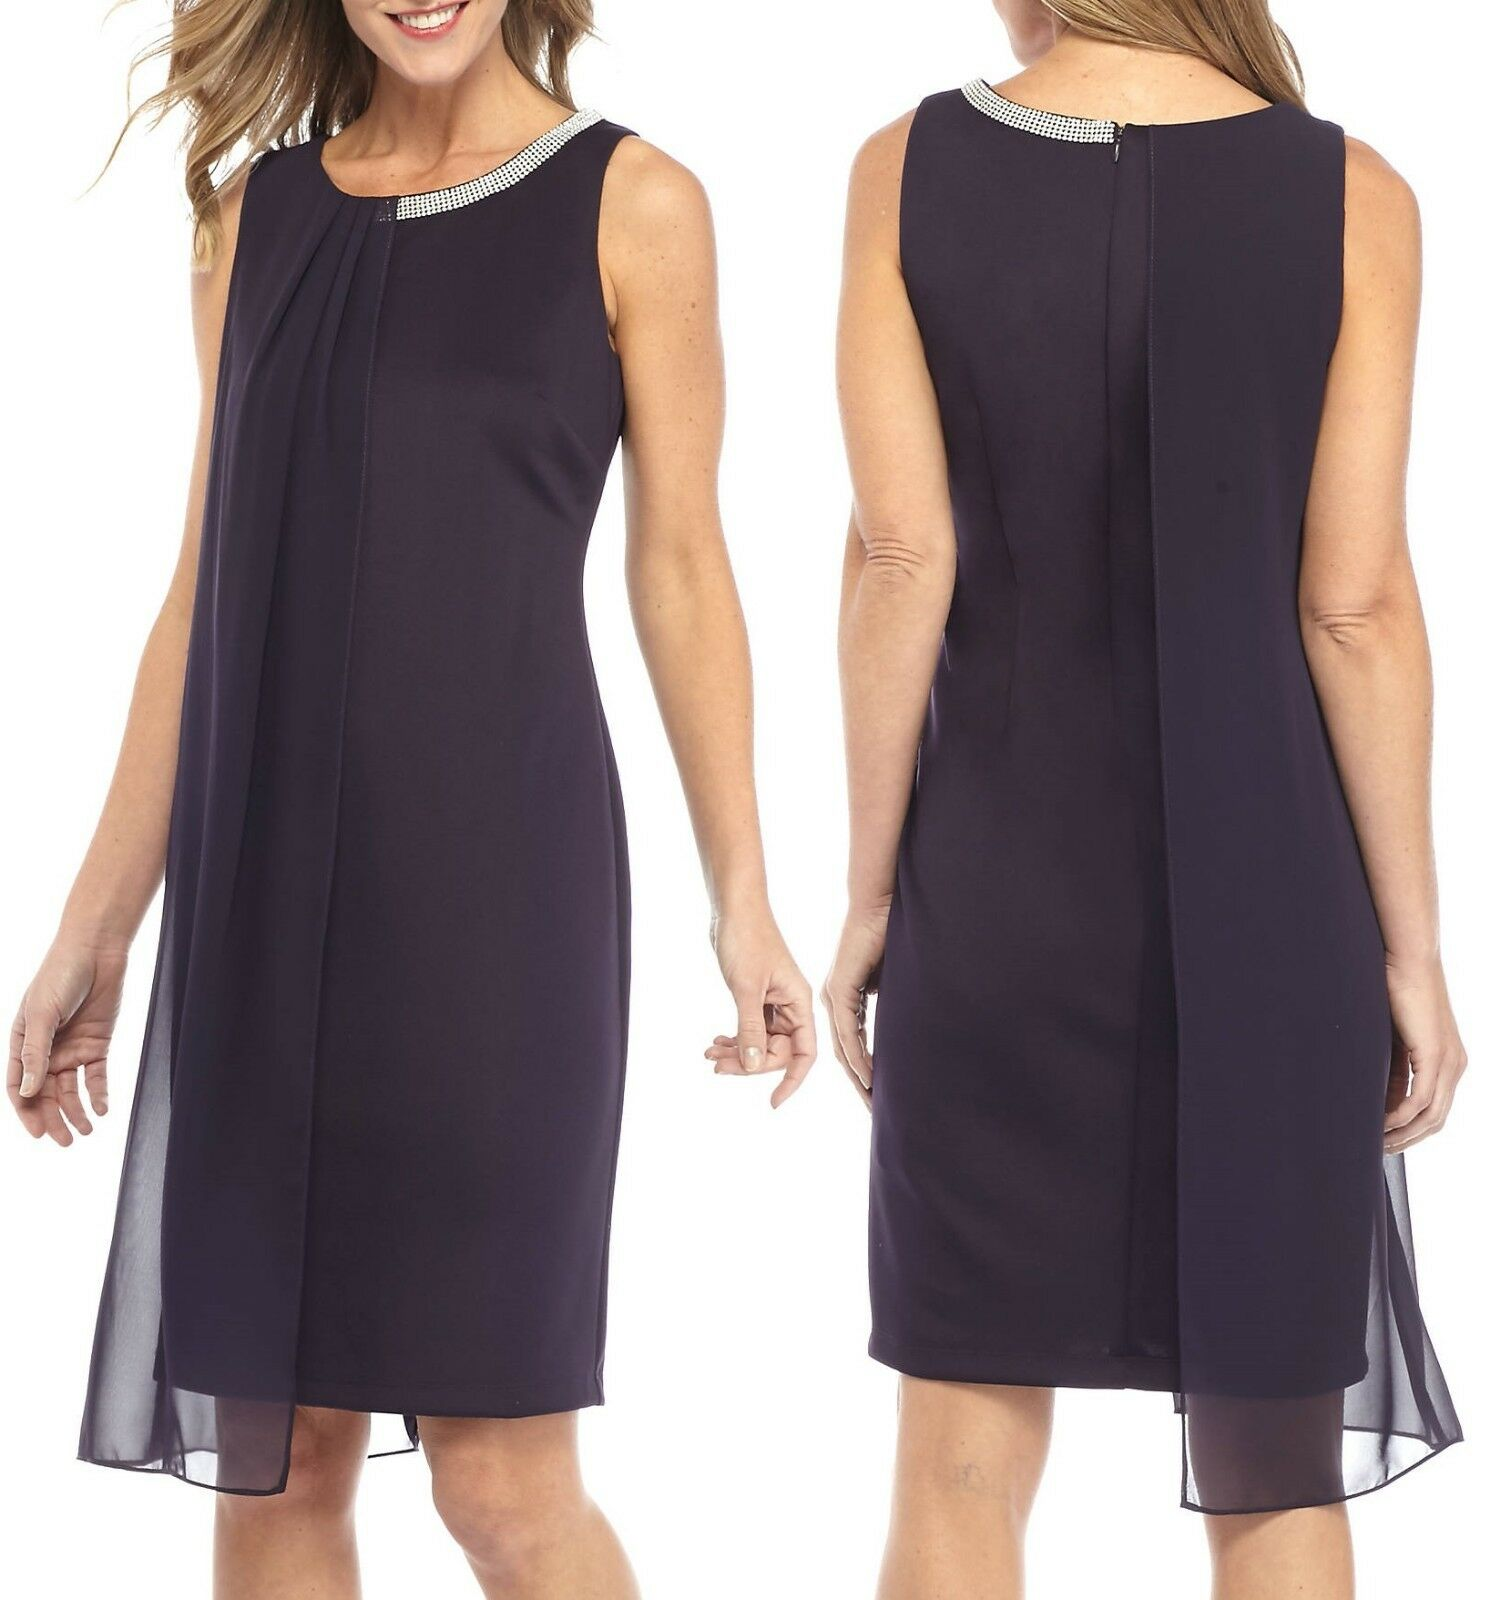 SL Fashions SLNY Storm lila Beaded Neck Sheer Overlay Stretch Ponte Dress